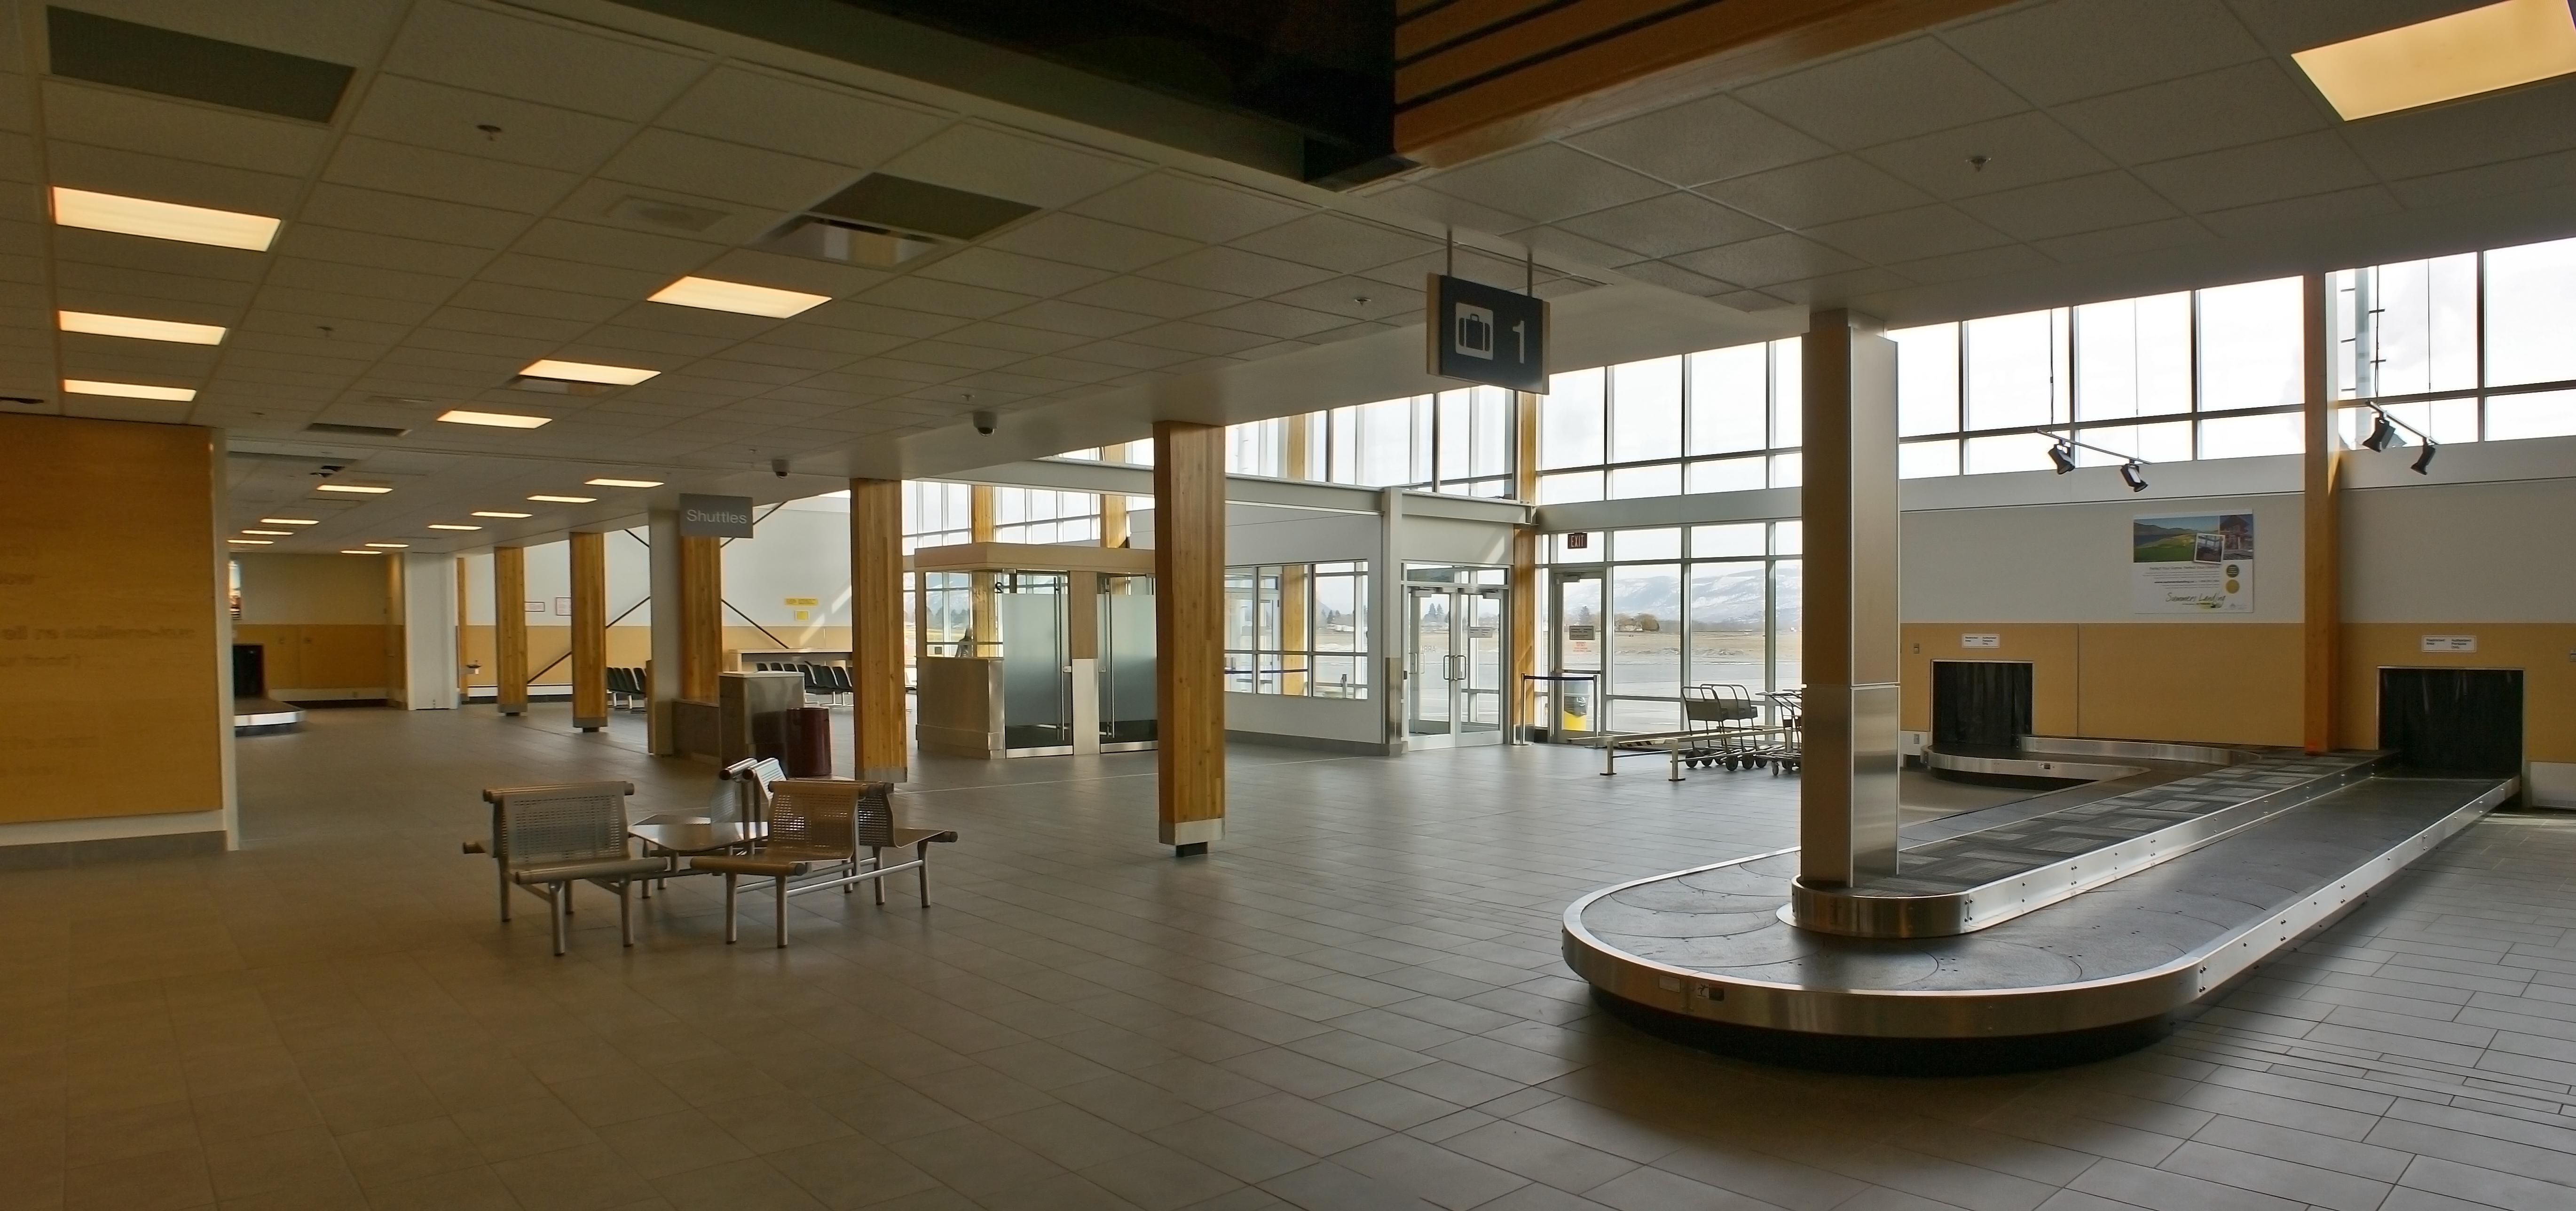 Kamloops Airport Enterprise Car Rental